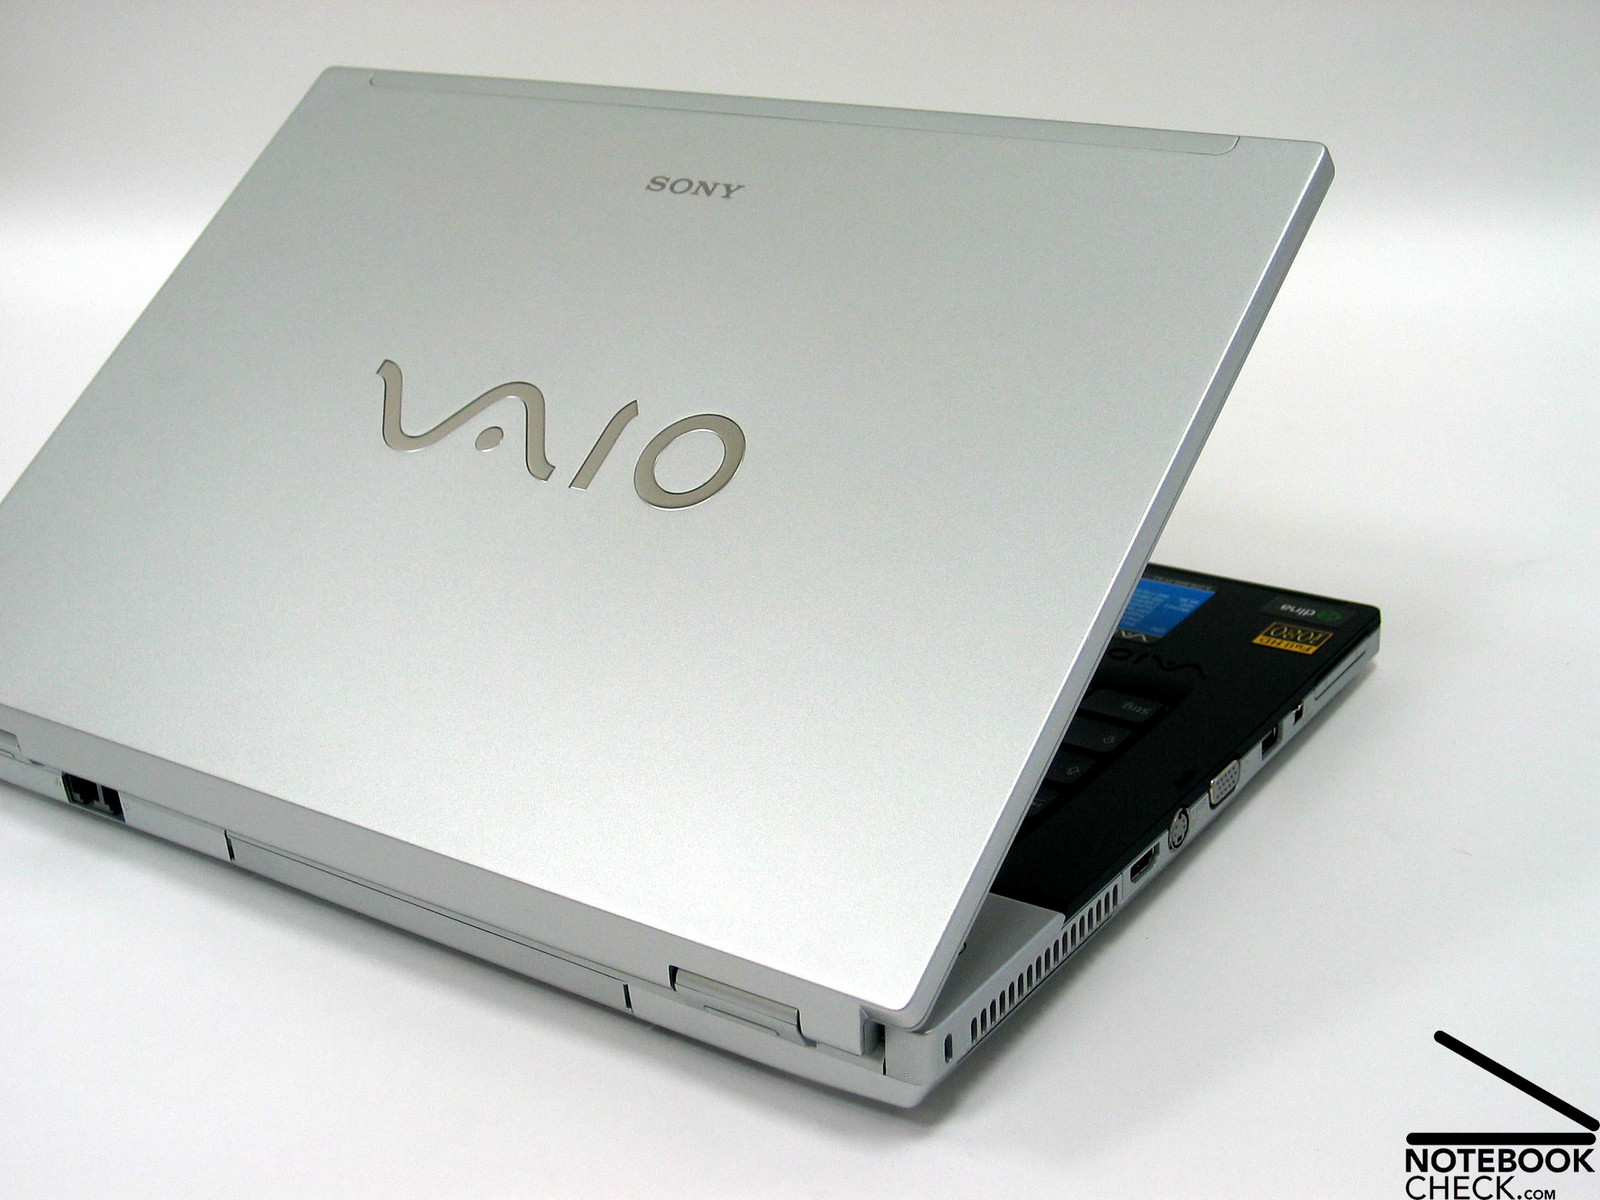 Test Sony Vaio VGN-FZ21E Notebook - Notebookcheck.com Tests